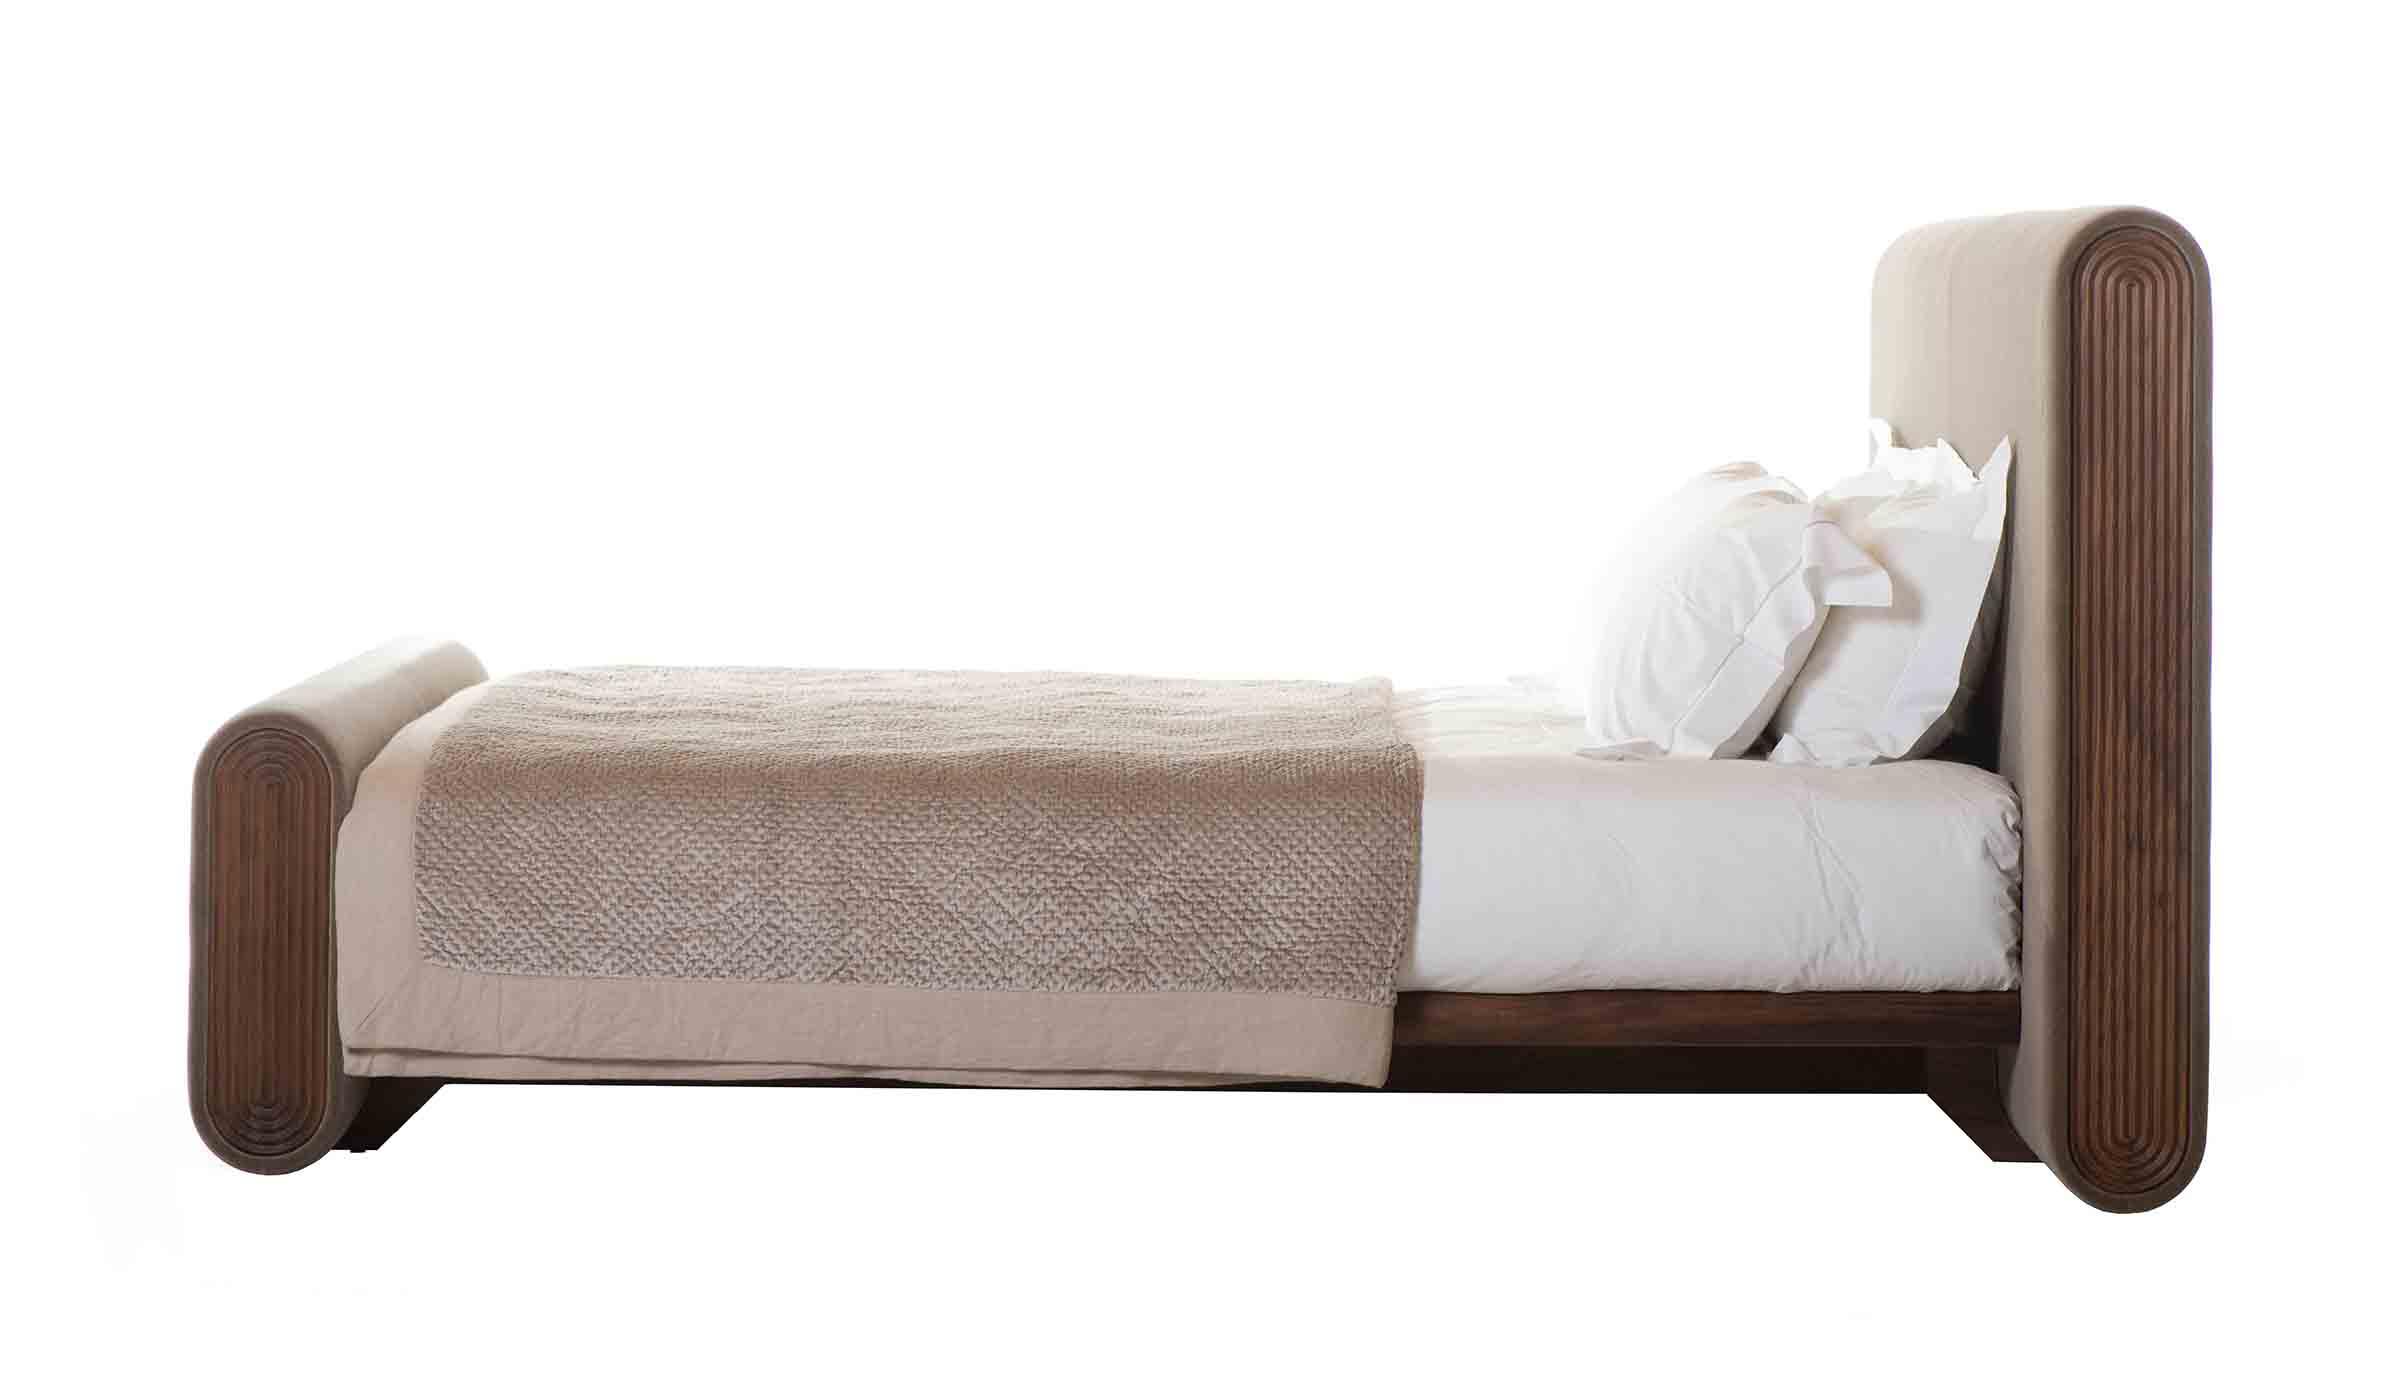 'Union' bed, designed by Autoban for De La Espada